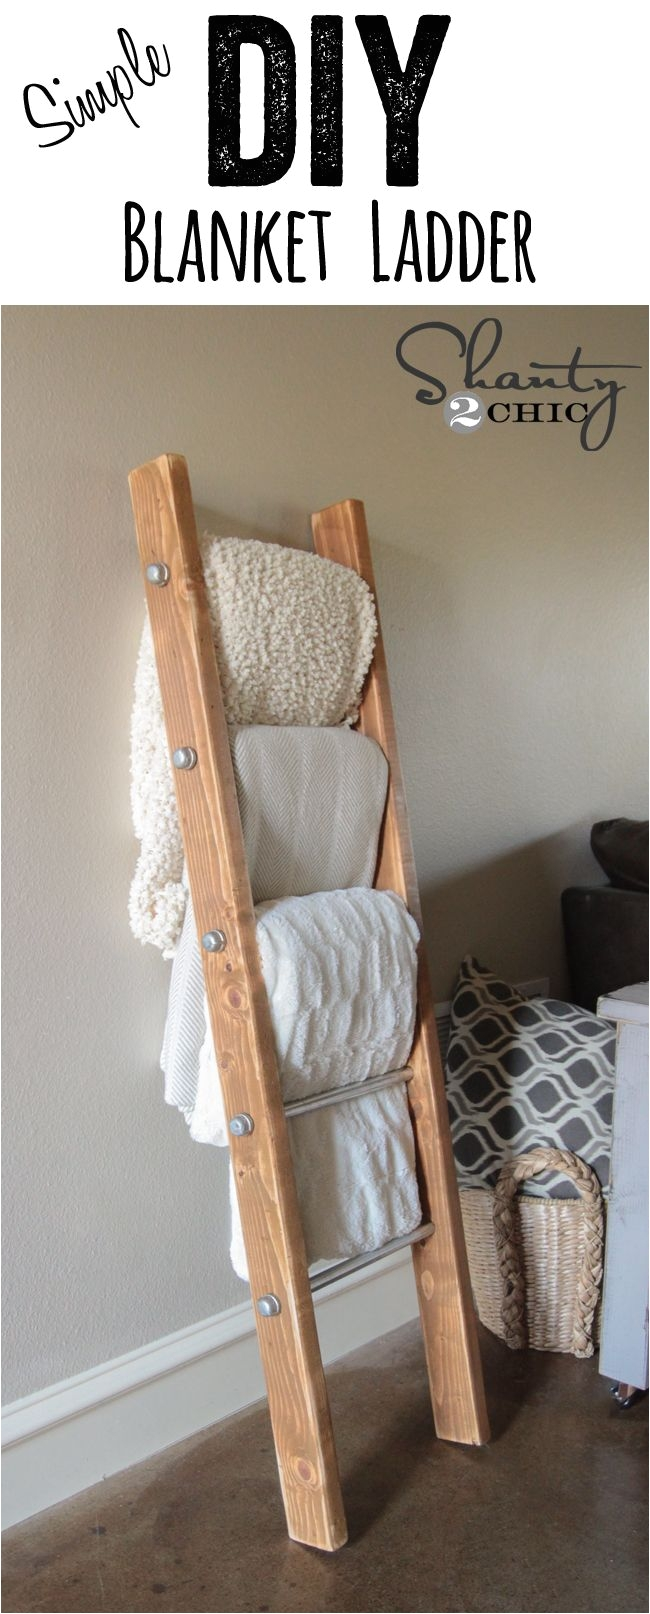 Diy Wooden Blanket Rack Diy Wood and Metal Pipe Blanket Ladder Pinterest Blanket Ladder